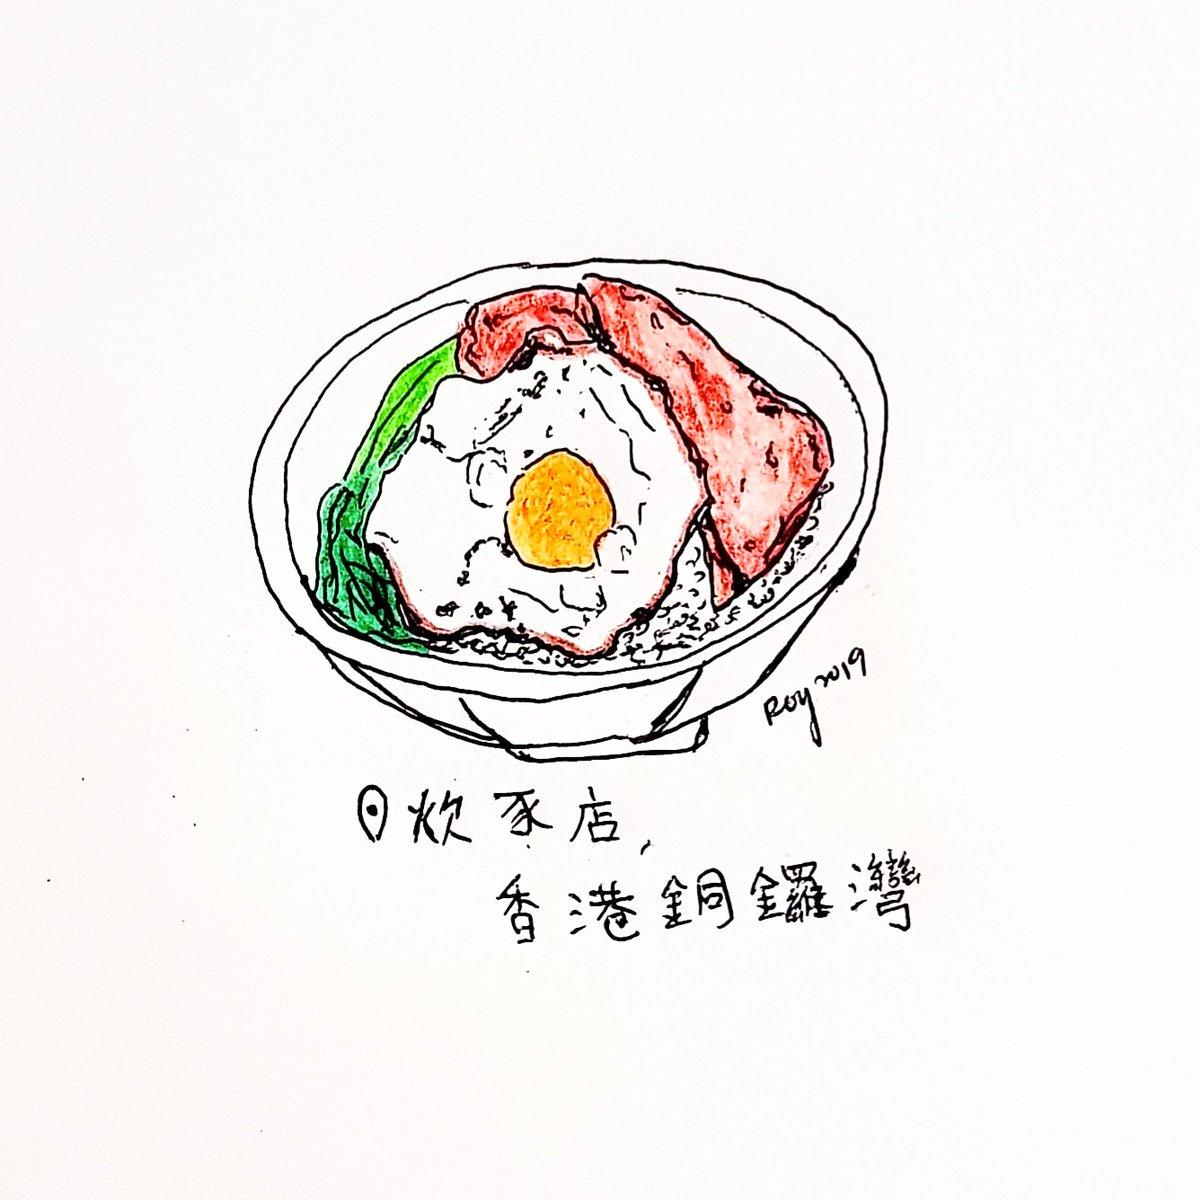 Lunch time @hogology  #香港 #銅鑼灣 #香港美食 #炊豕店 #午餐 #台湾菜 #lunchtime #lunch #hongkong #art #sketch #artist #instaart #artistsofinstagram #artistsoninstagram #illustration #foodillustration #ilovehongkong #foodporn #foodgasm #foodie #foodstagram #causewaybay pic.twitter.com/mibt28kr6c